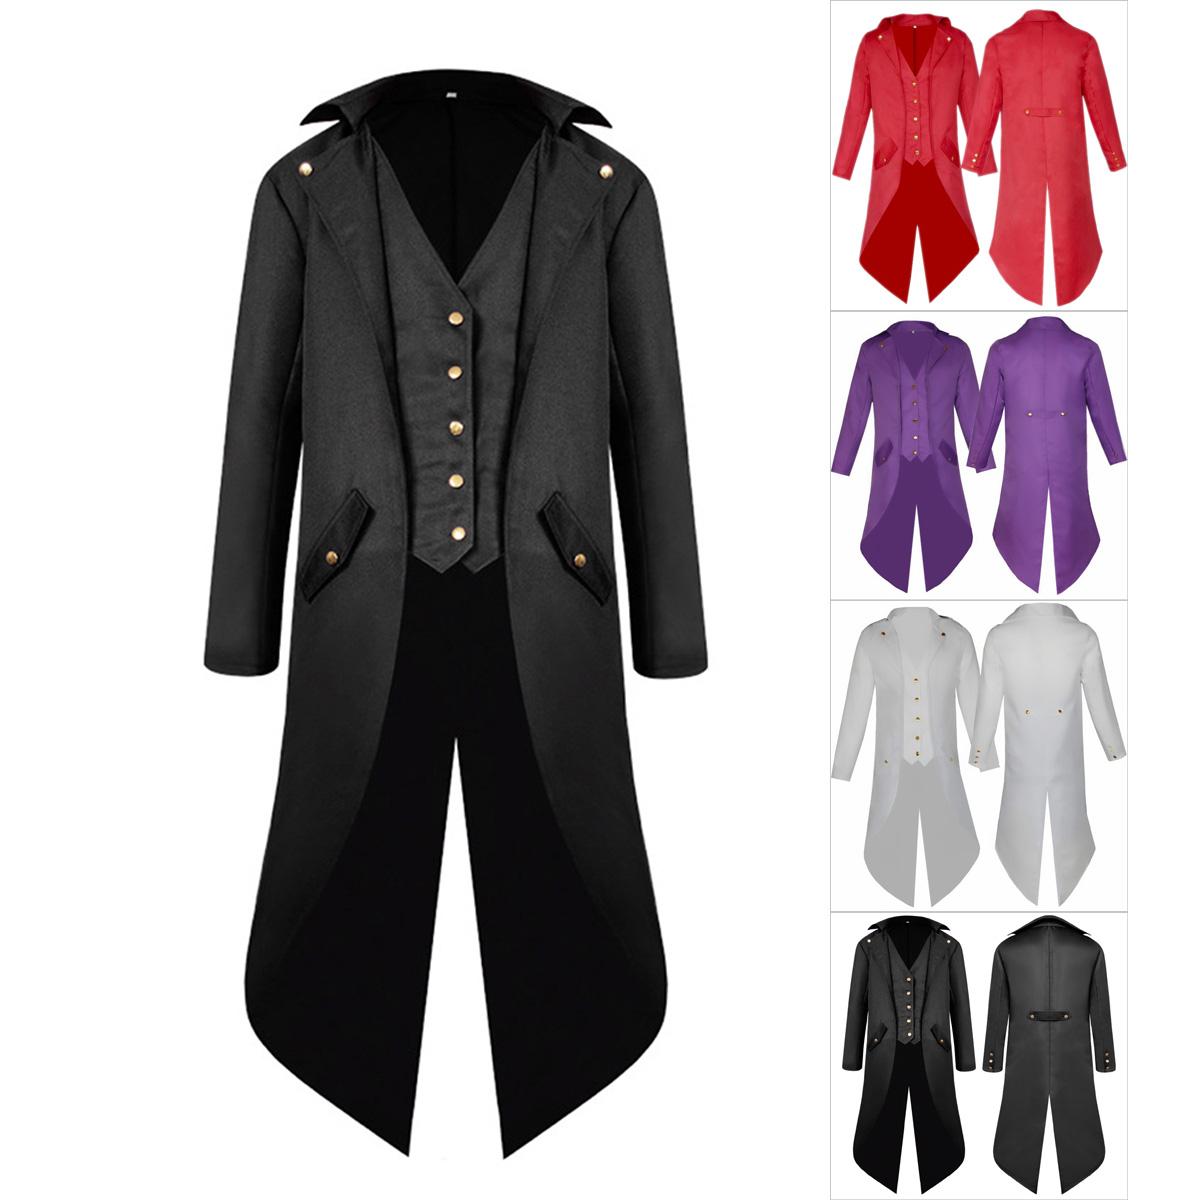 Vintage Men/'s Steampunk Tailcoat Jacket Gothic Victorian Coat Cosplay Suit